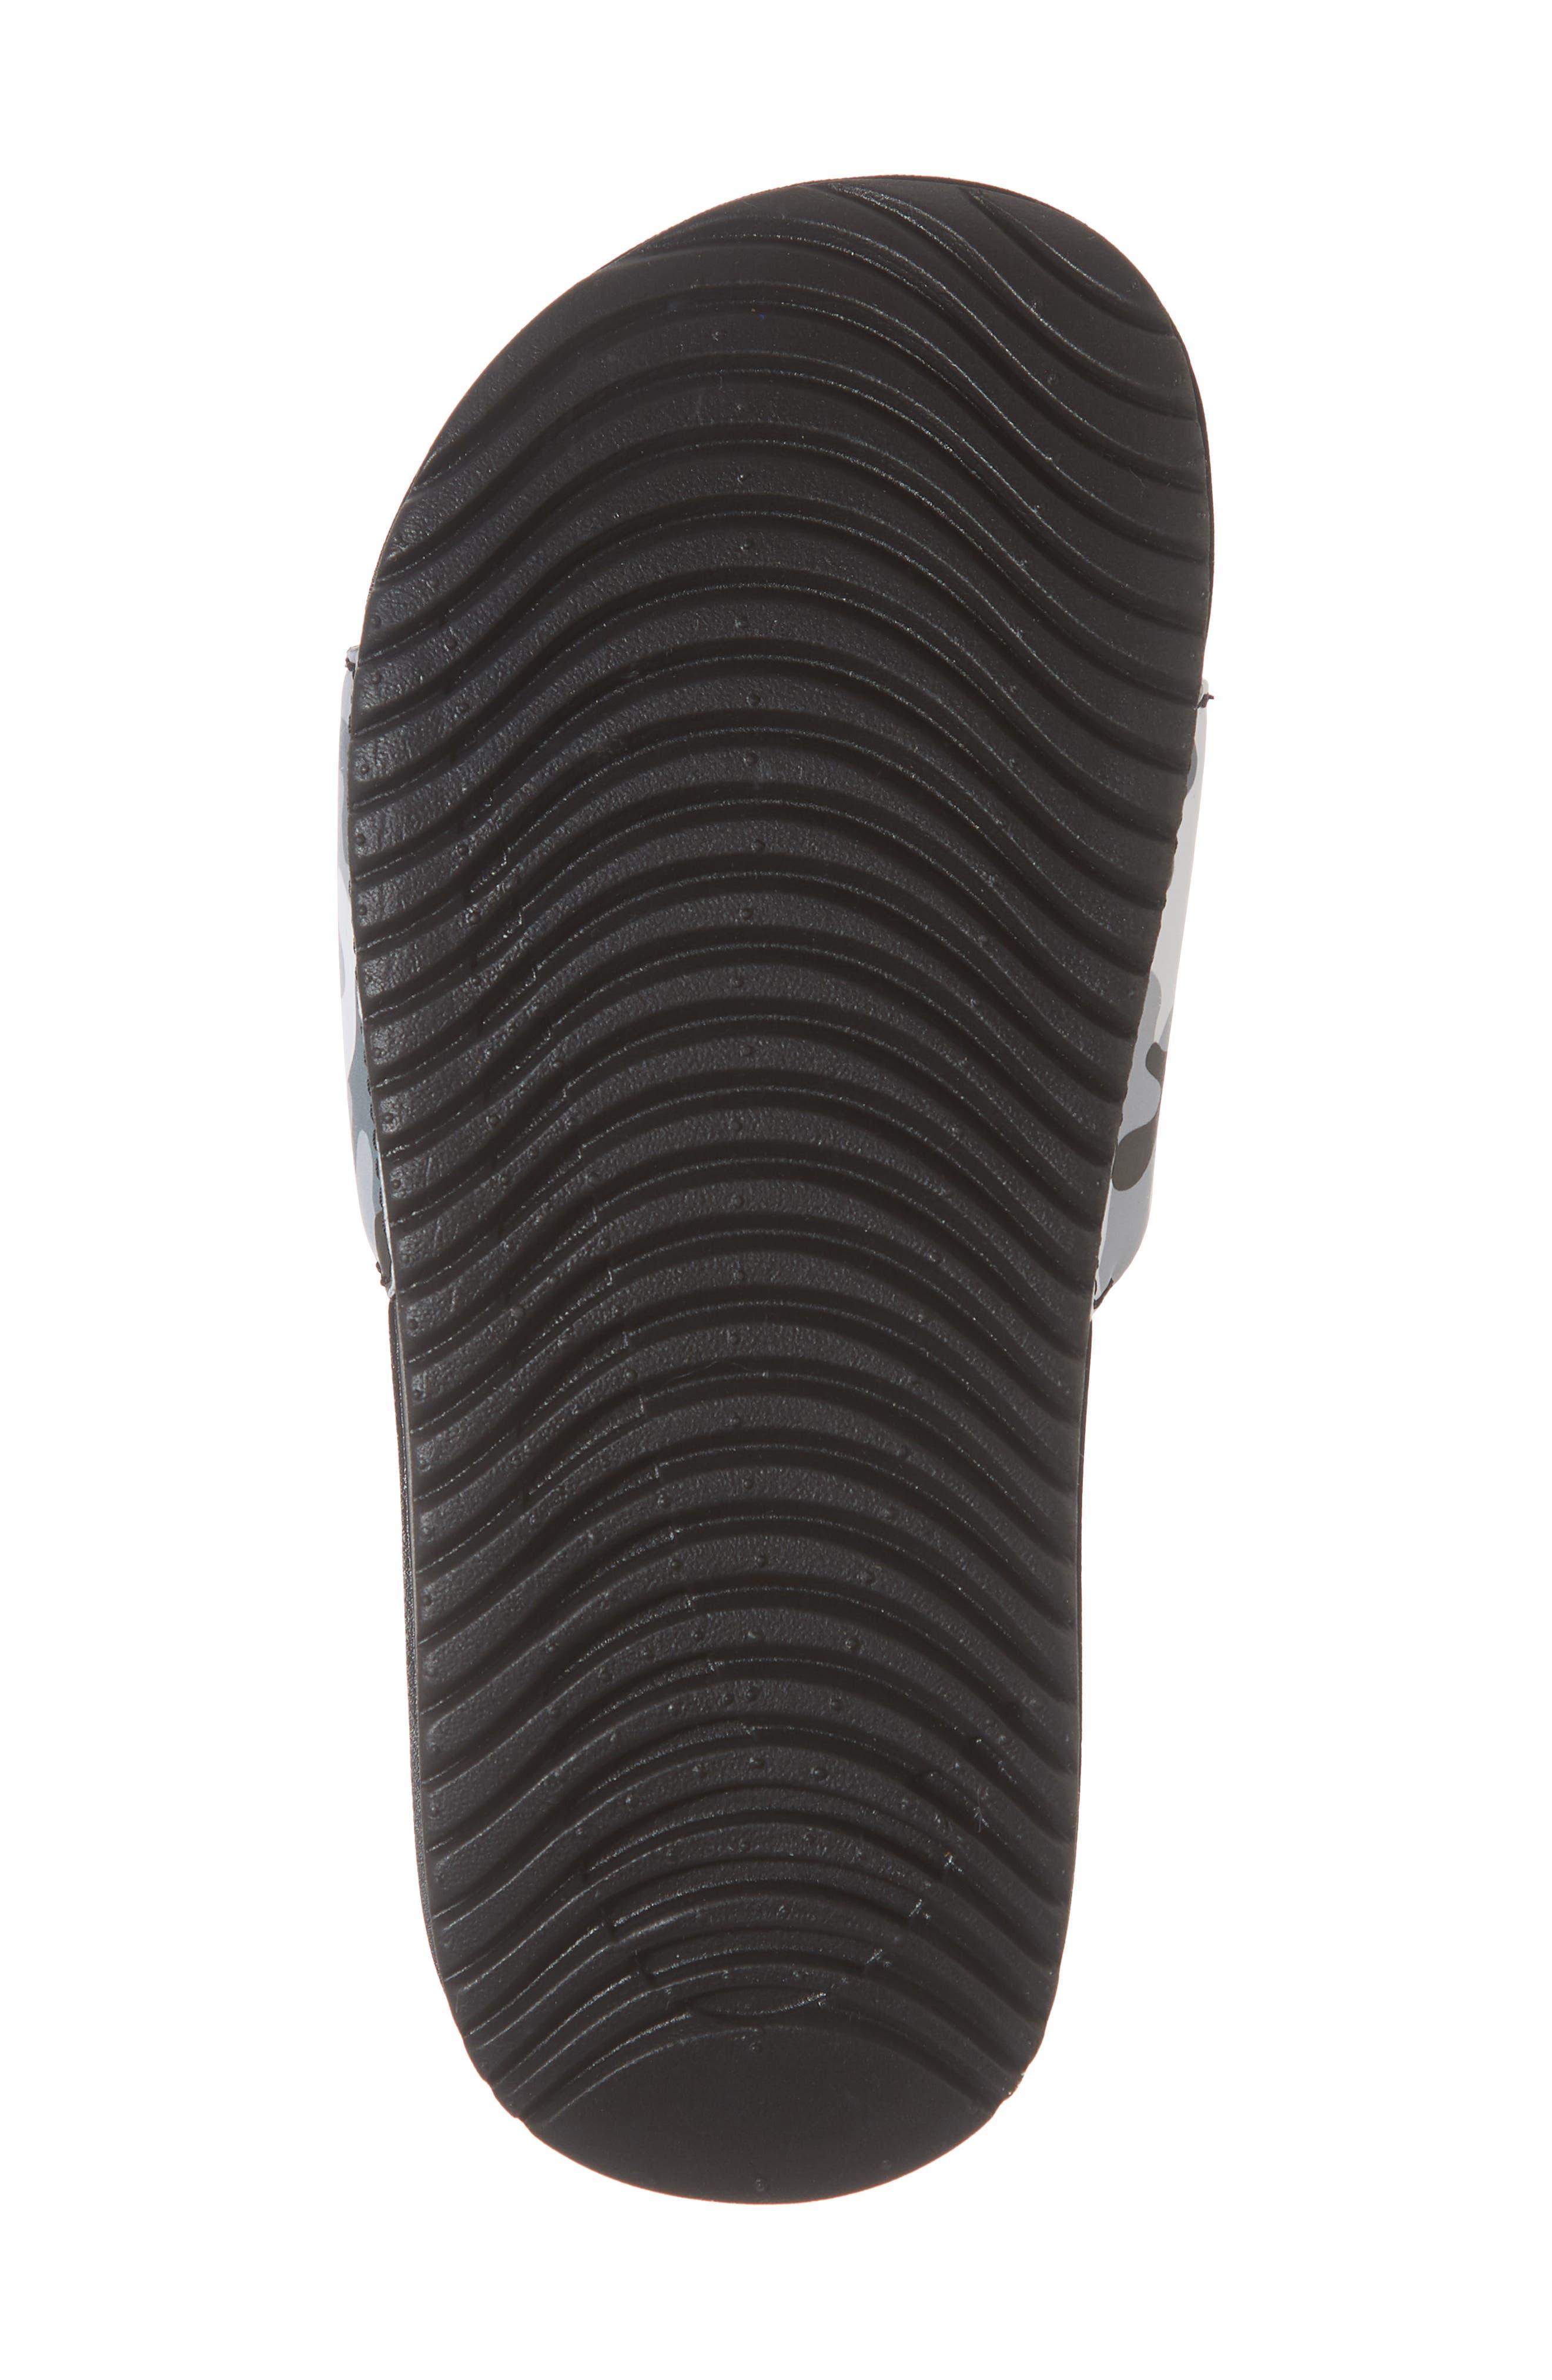 NIKE, Kawa Slide Sandal, Alternate thumbnail 6, color, WOLF GREY/ BLACK/ WHITE